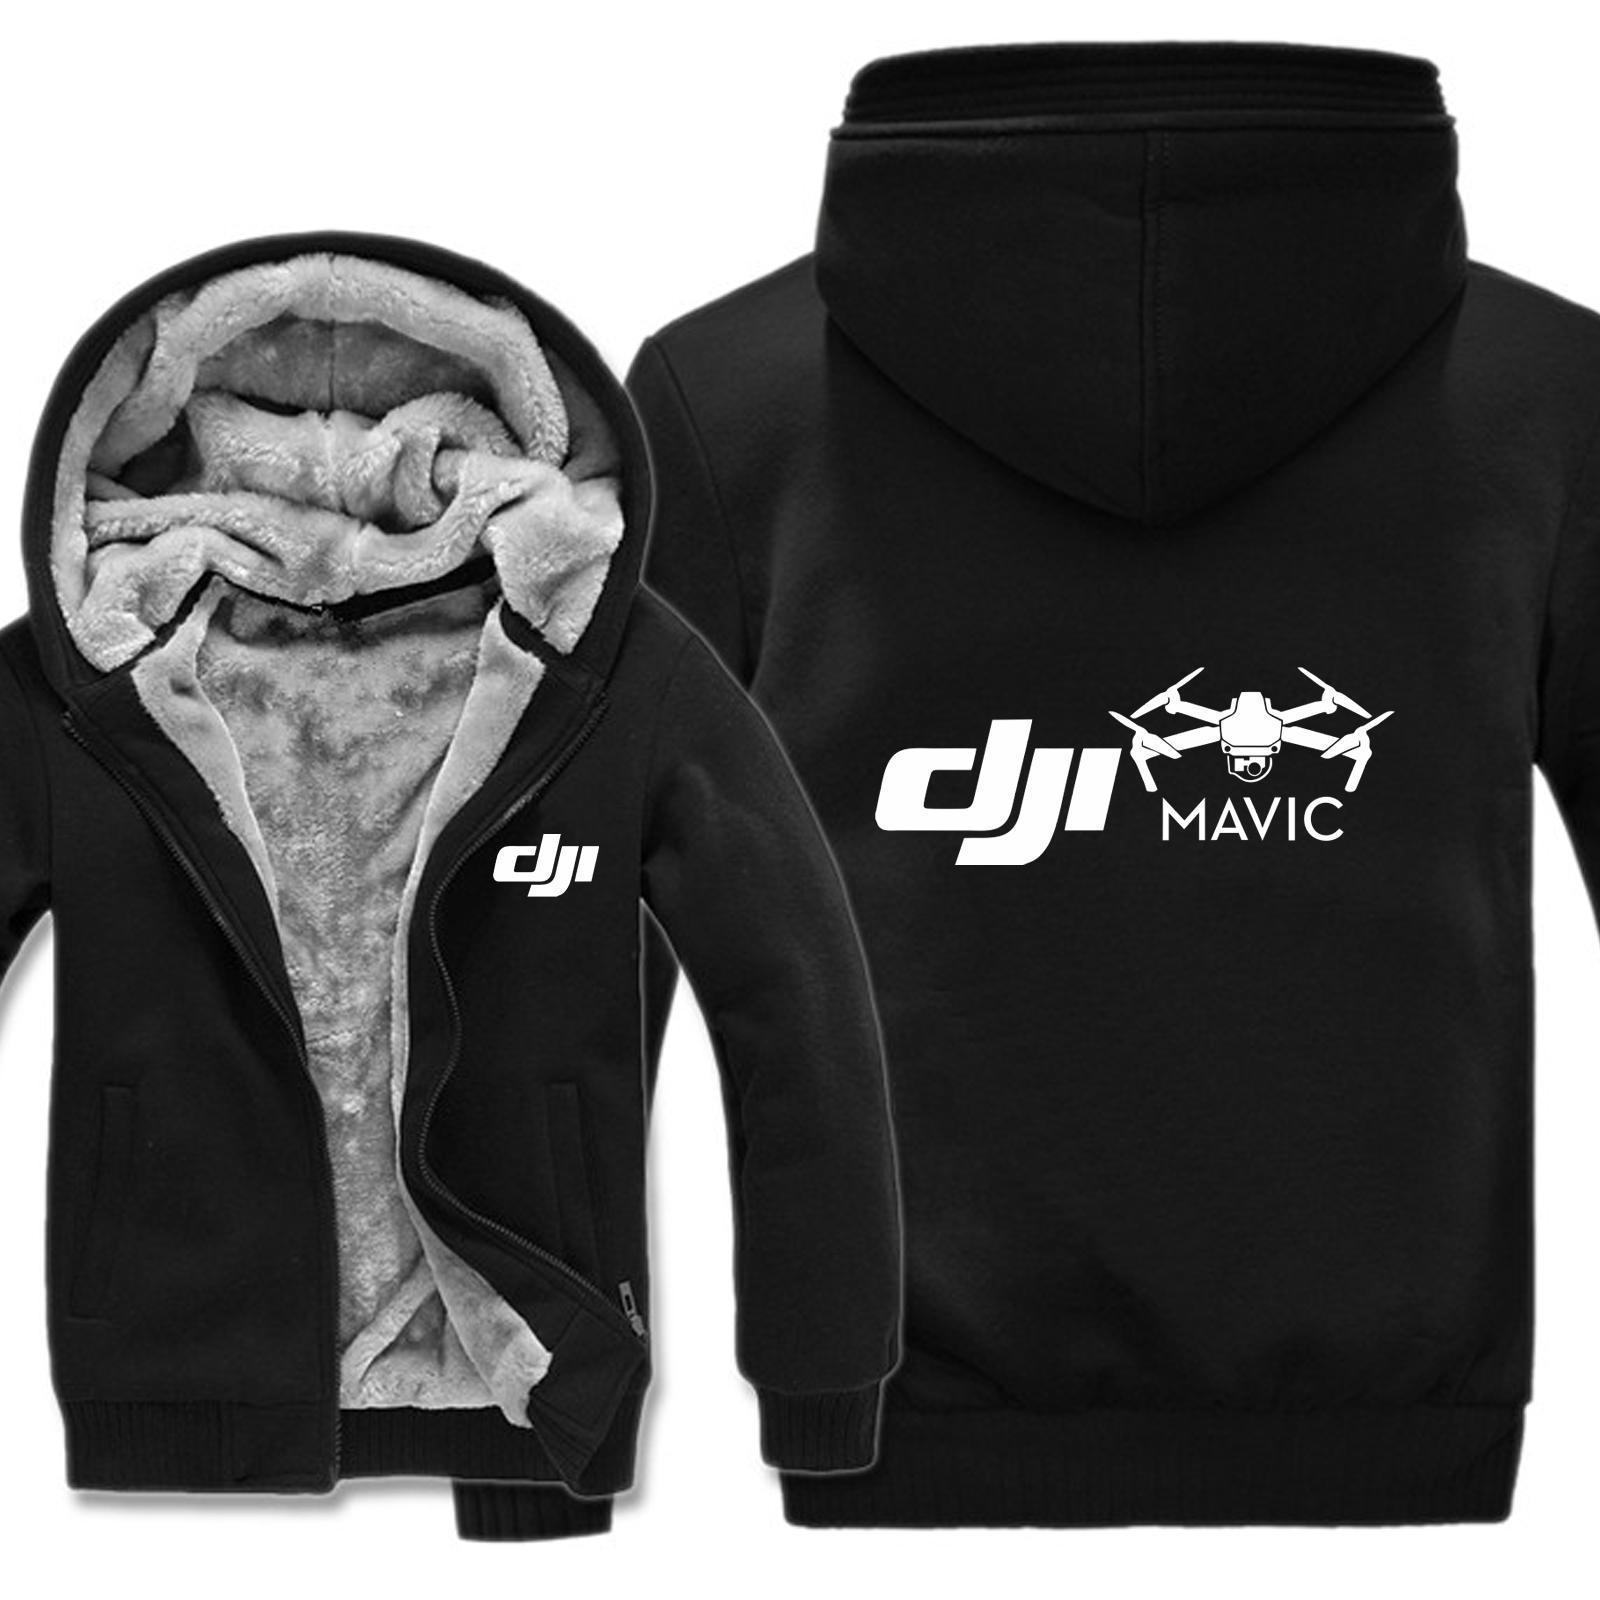 Mavic Pilot Hoodies Männer Verdicken Winterjacke Lustige Mann Kleidung DJI Sweatshirts Pullover